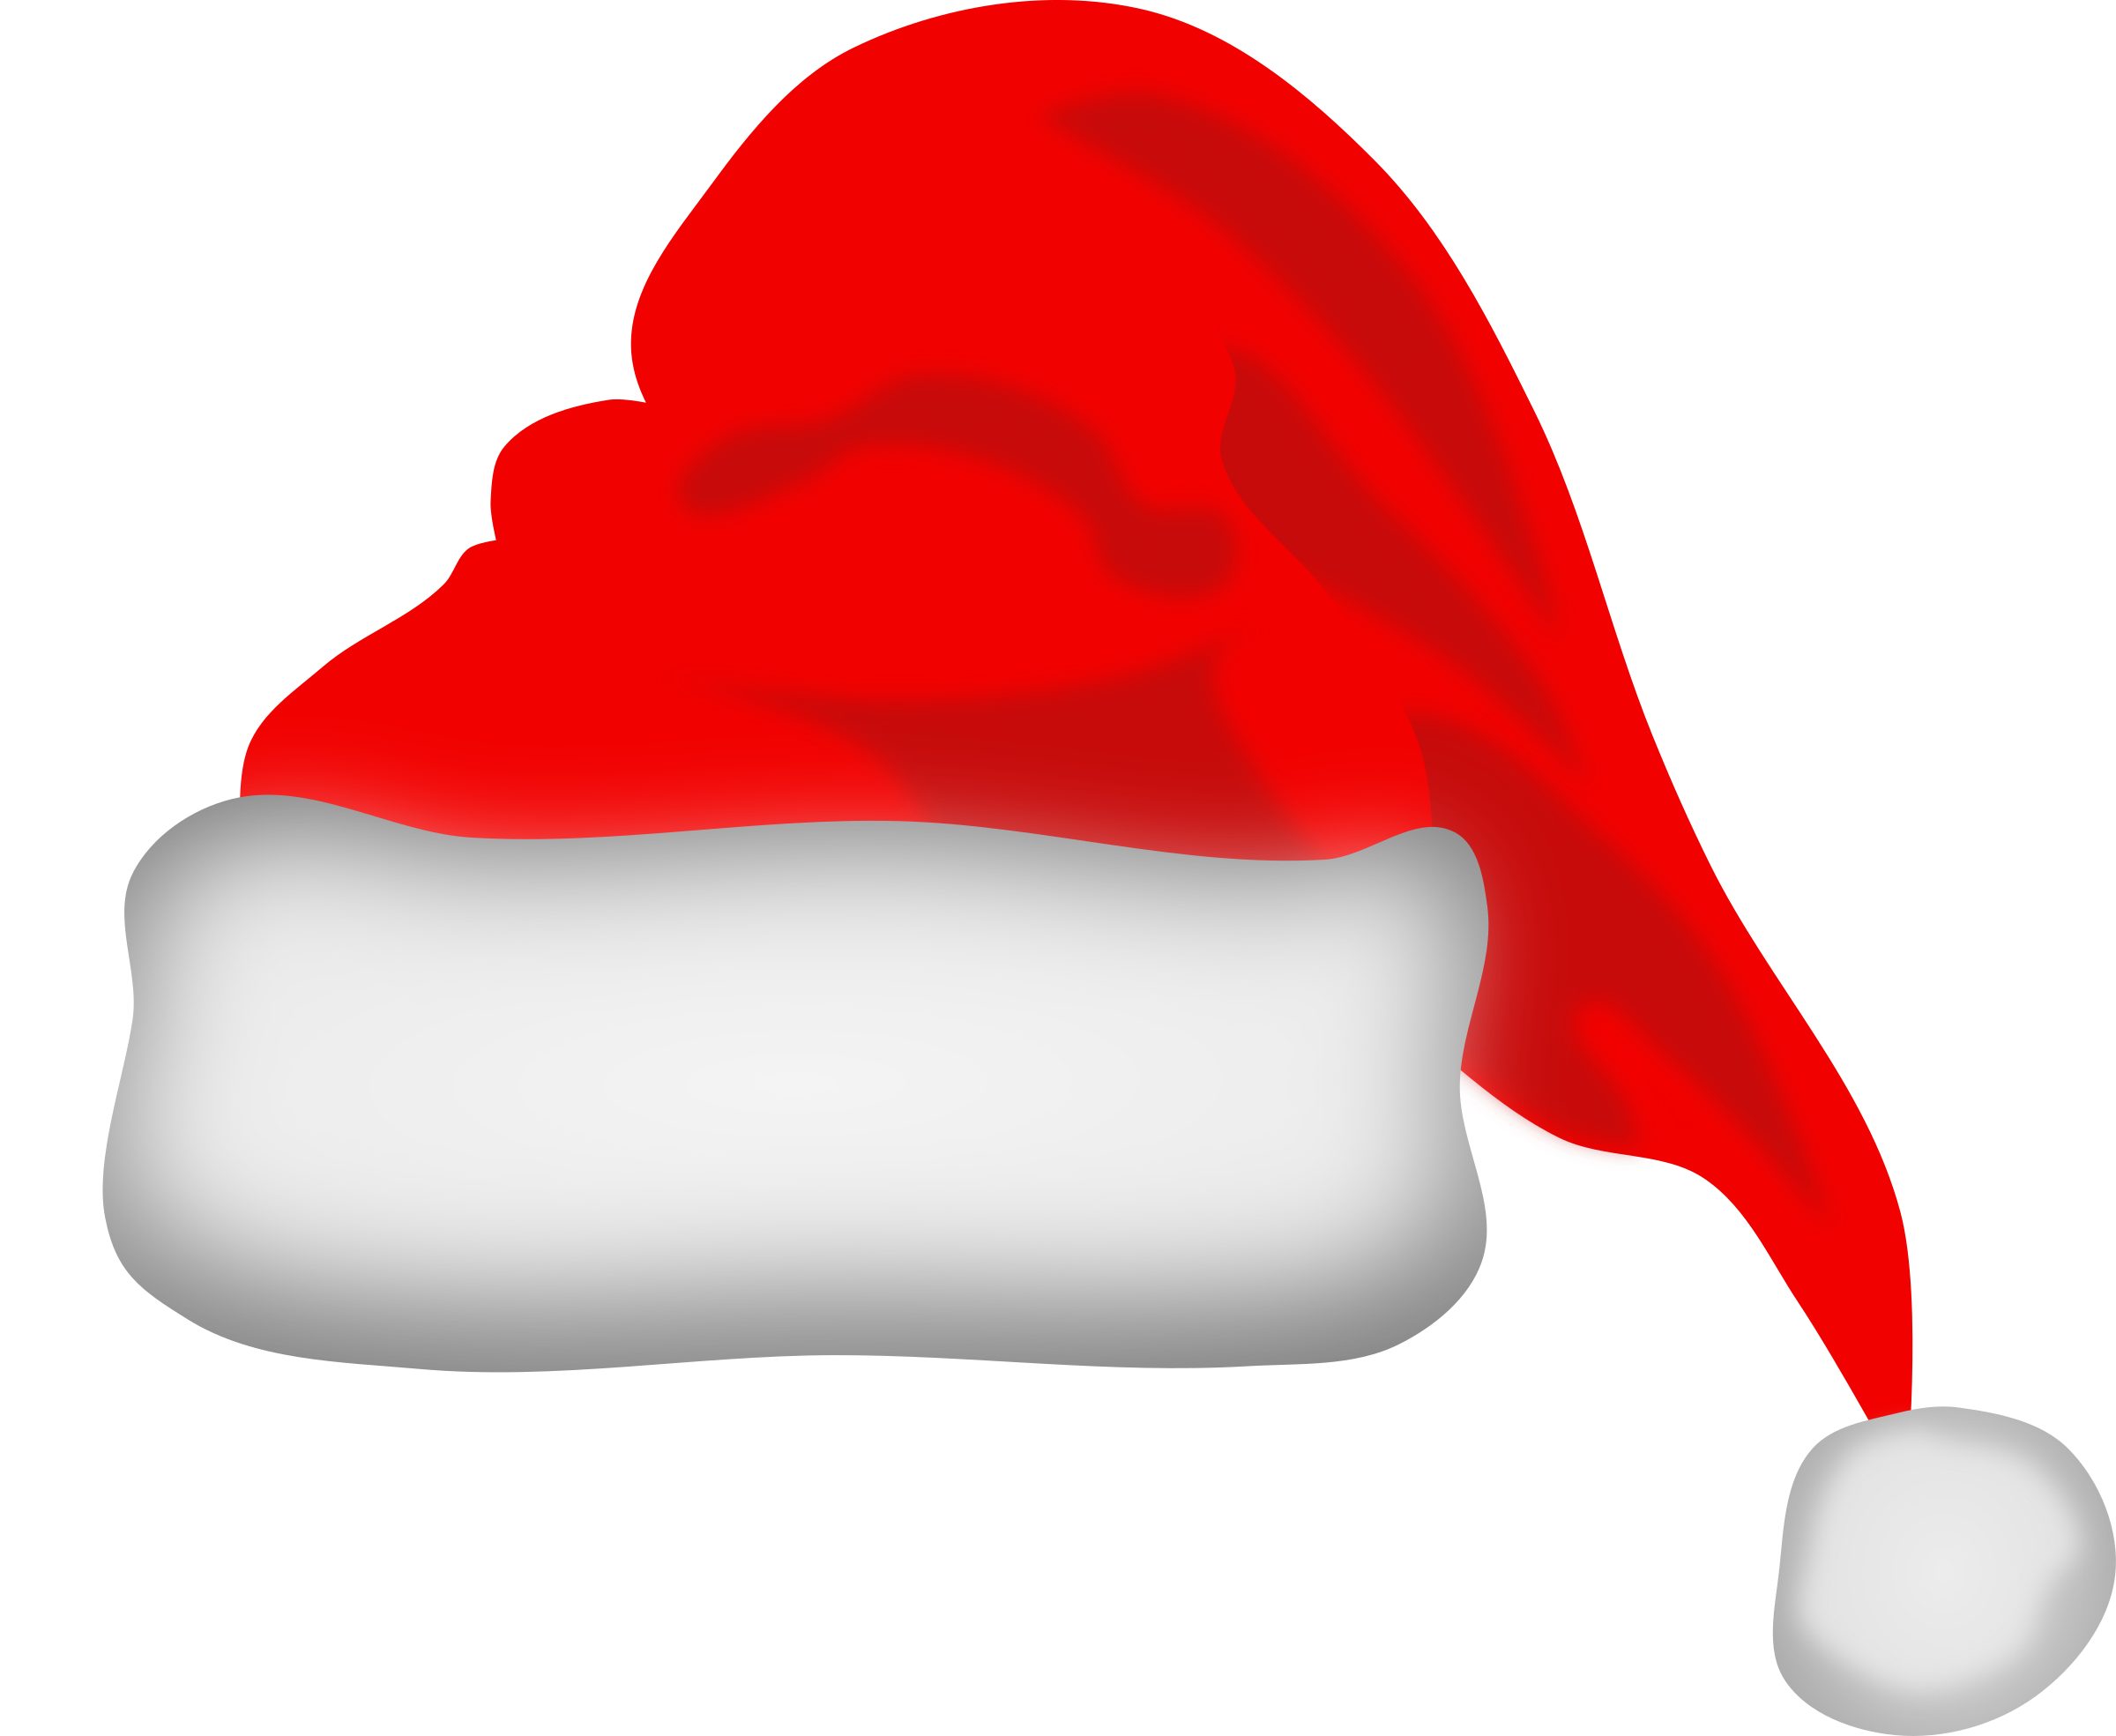 png icon santa hat 10277 transparentpng rh transparentpng com santa hat free vector graphic santa hat vector free download